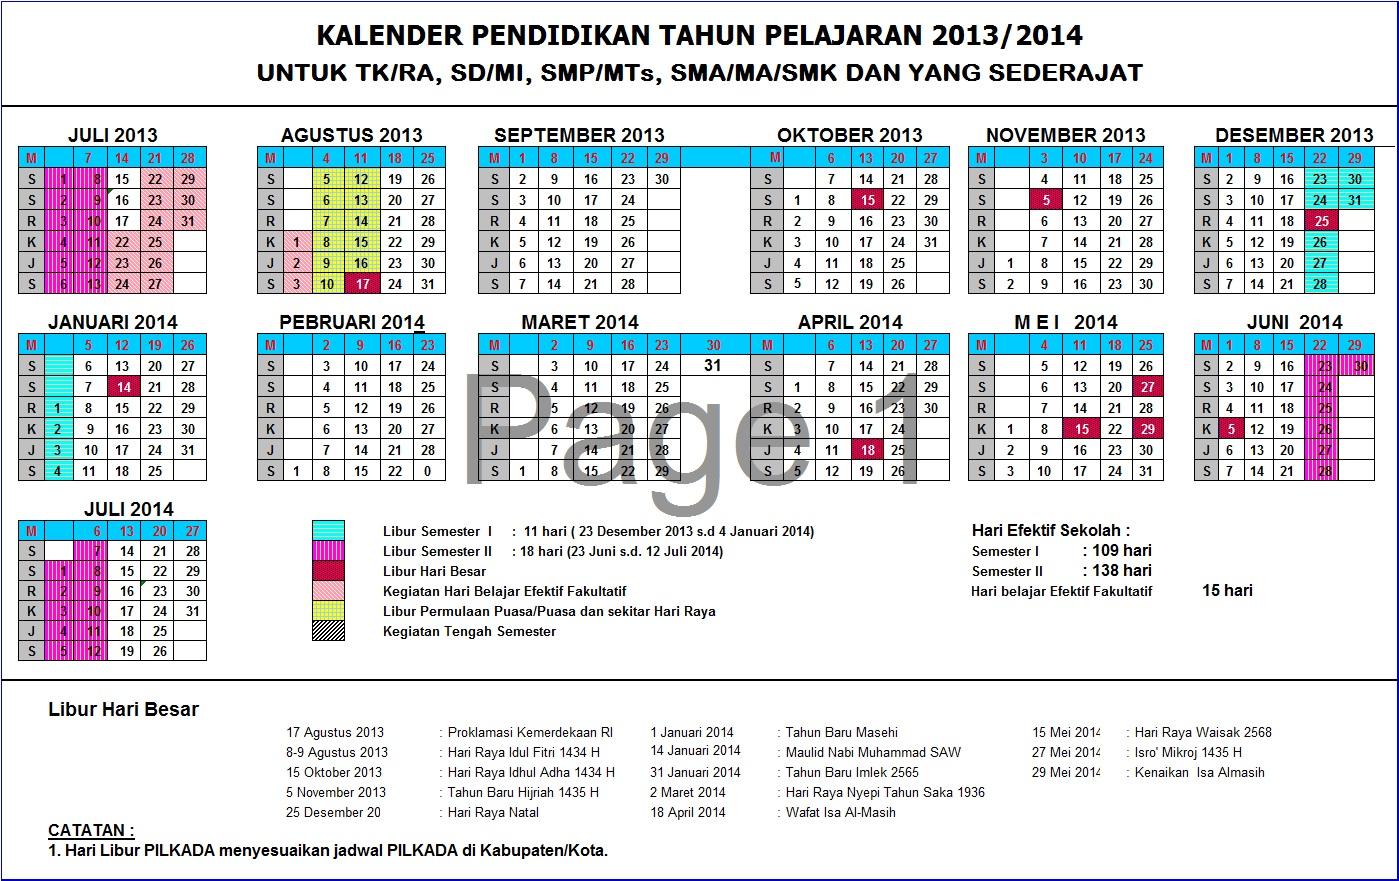 suguhkan kalender pendidikan tahun pelajaran 2013 2014 versi kalender